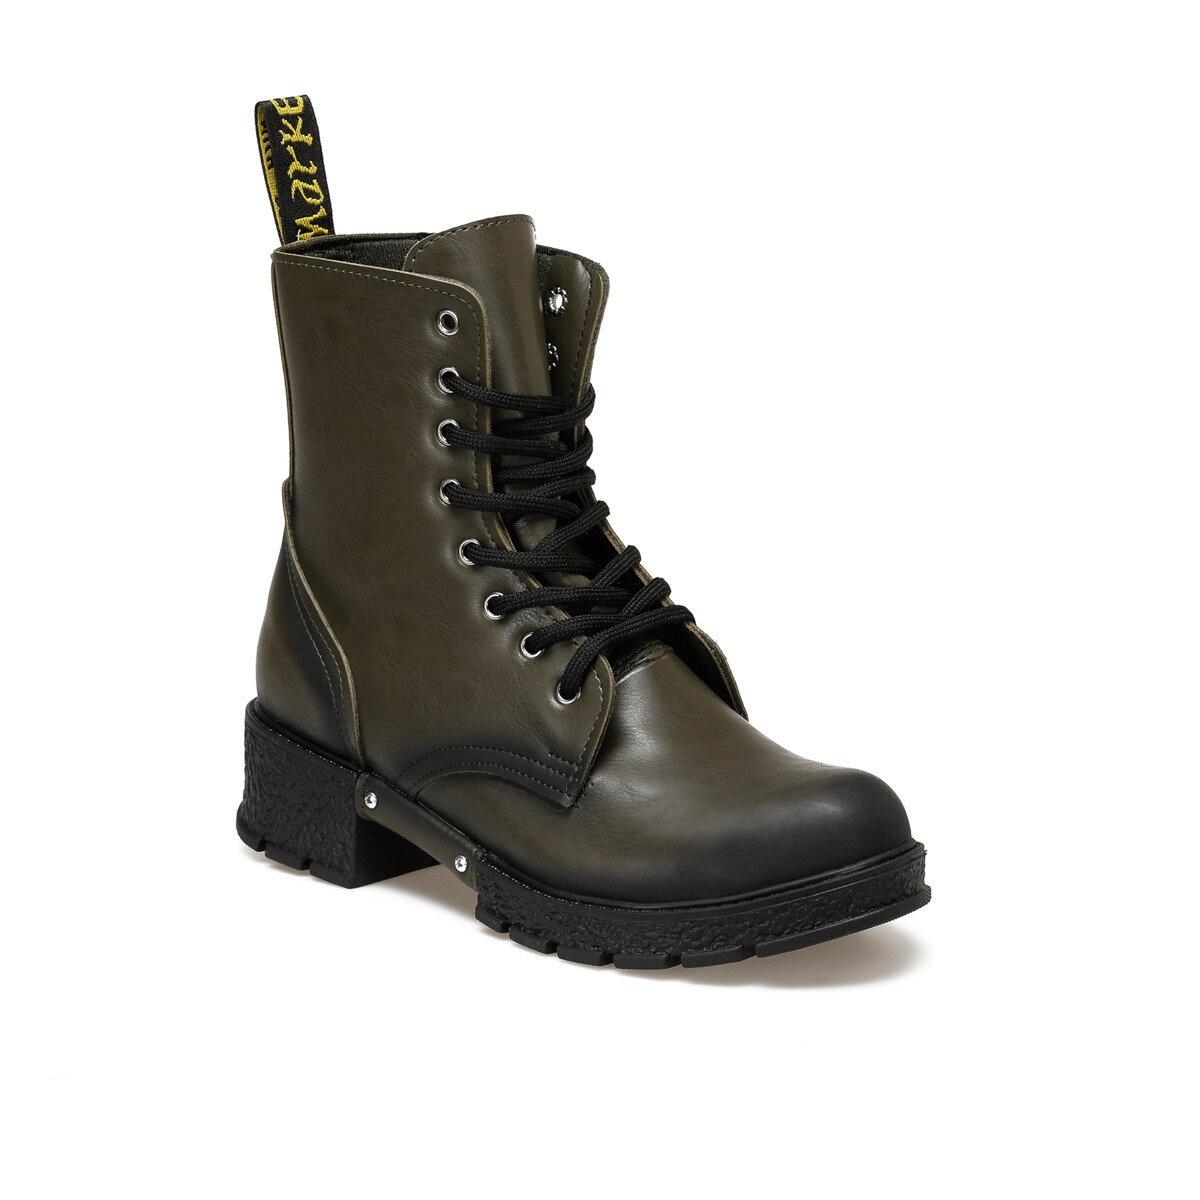 FLO 19SF-2012 الكاكي أحذية نسائية BUTIGO